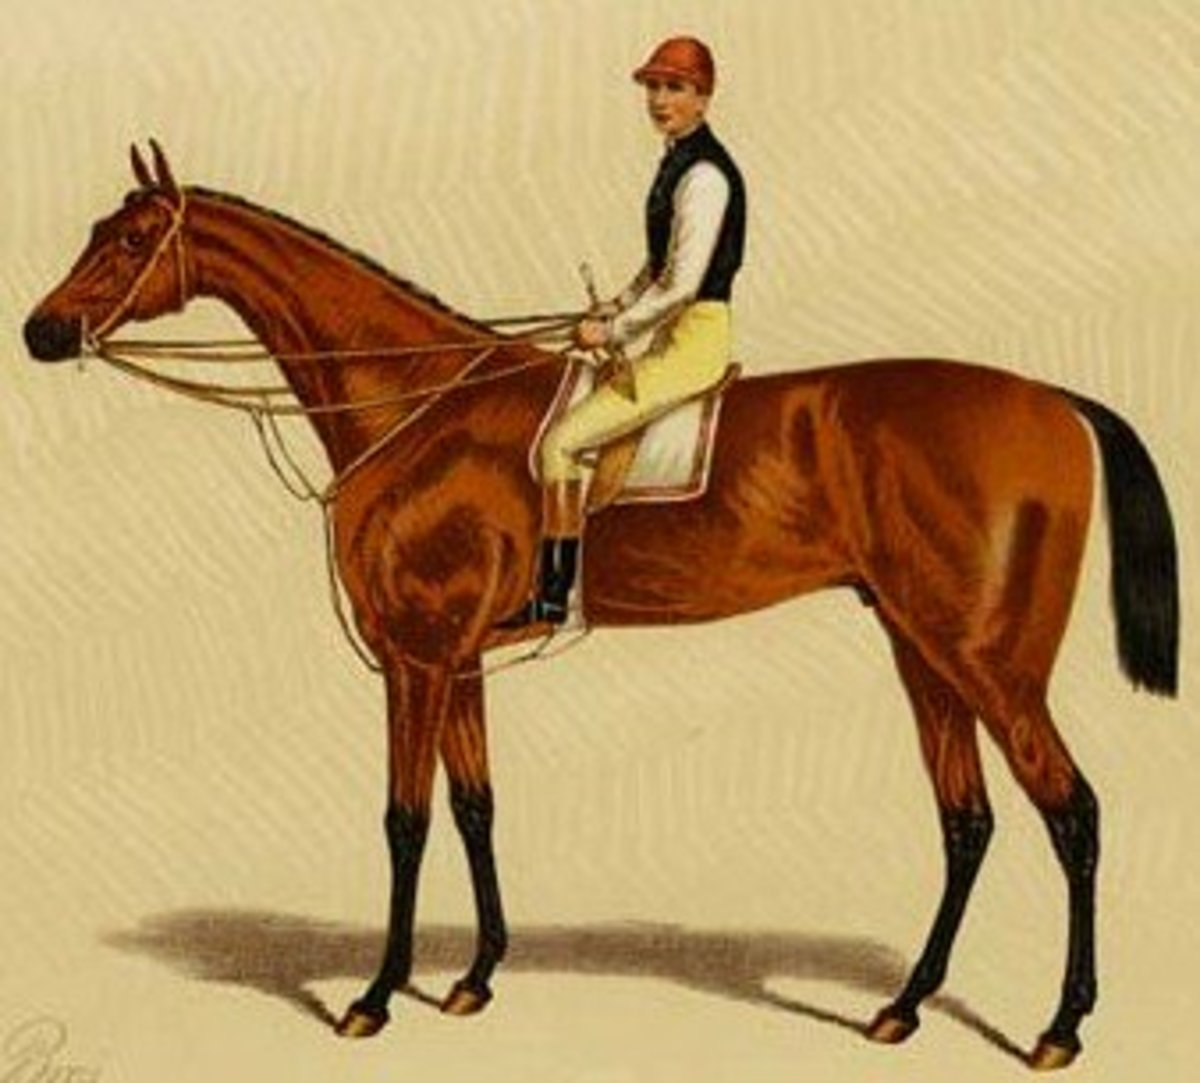 The Tragic Life of Jockey Fred Archer